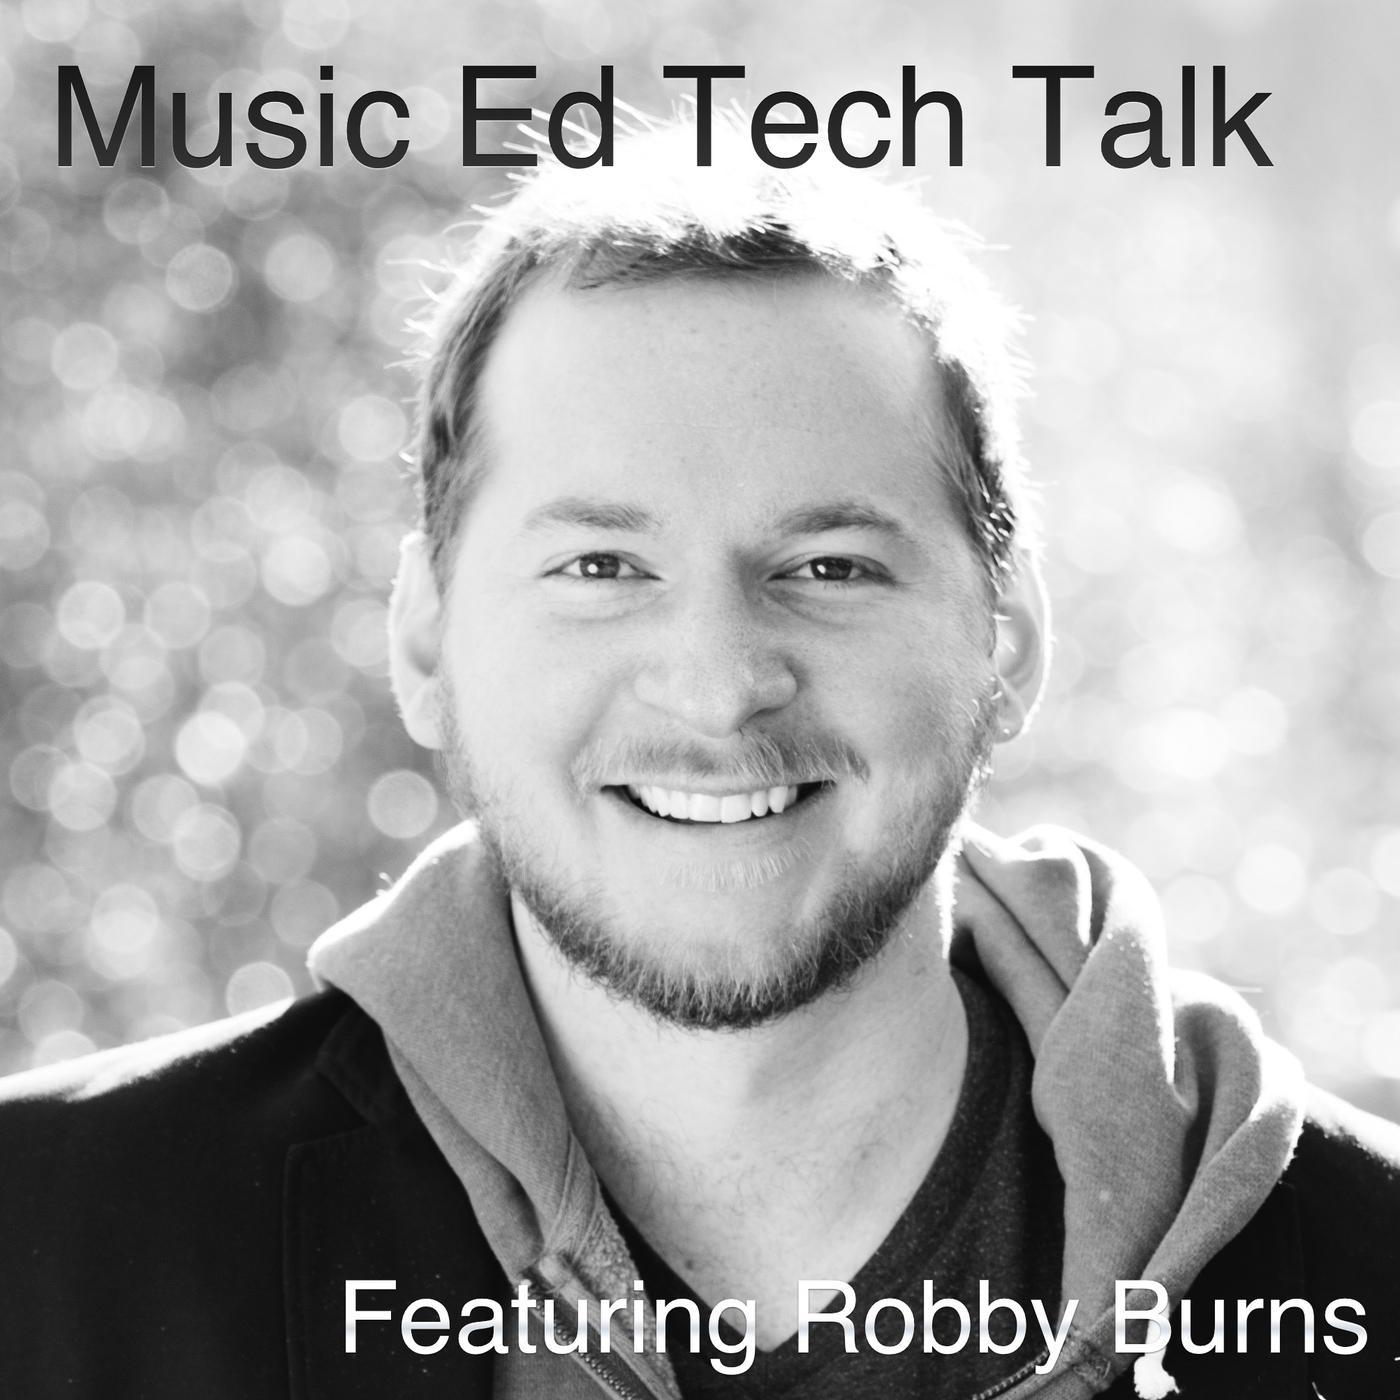 Music Ed Tech Talk (podcast) - Robby Burns | Listen Notes